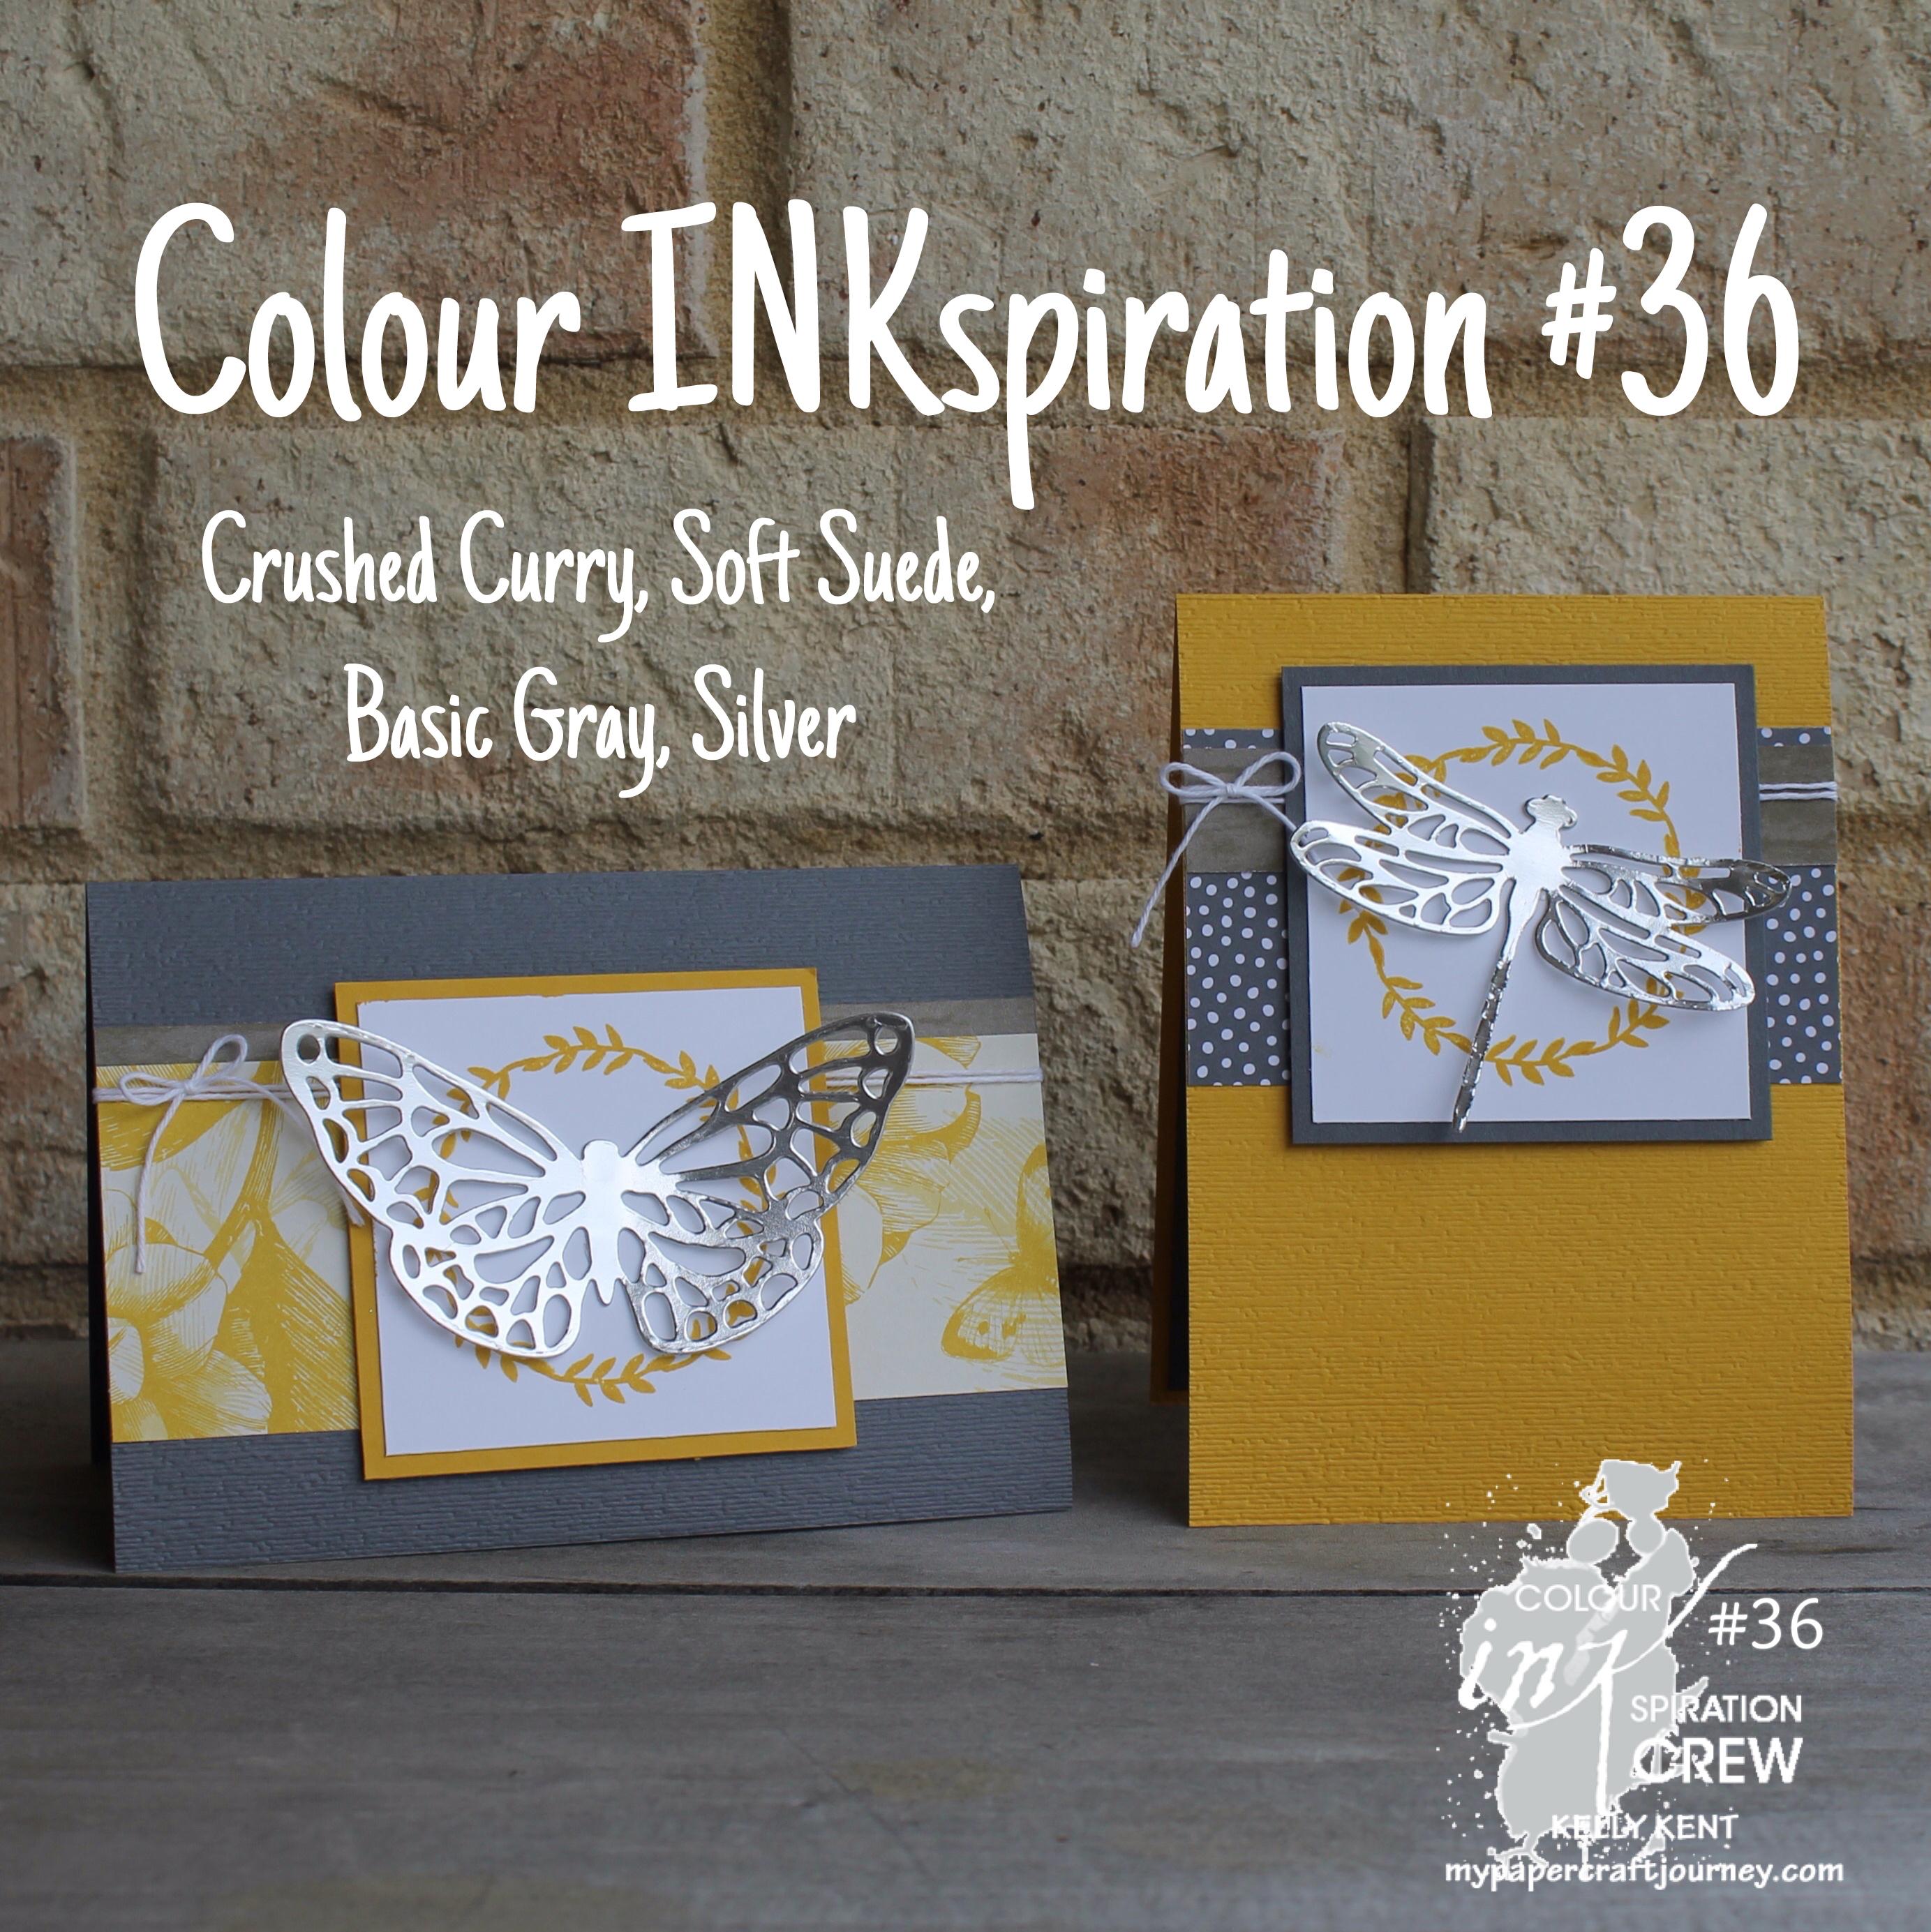 Colour INKspiration #36 | kelly kent